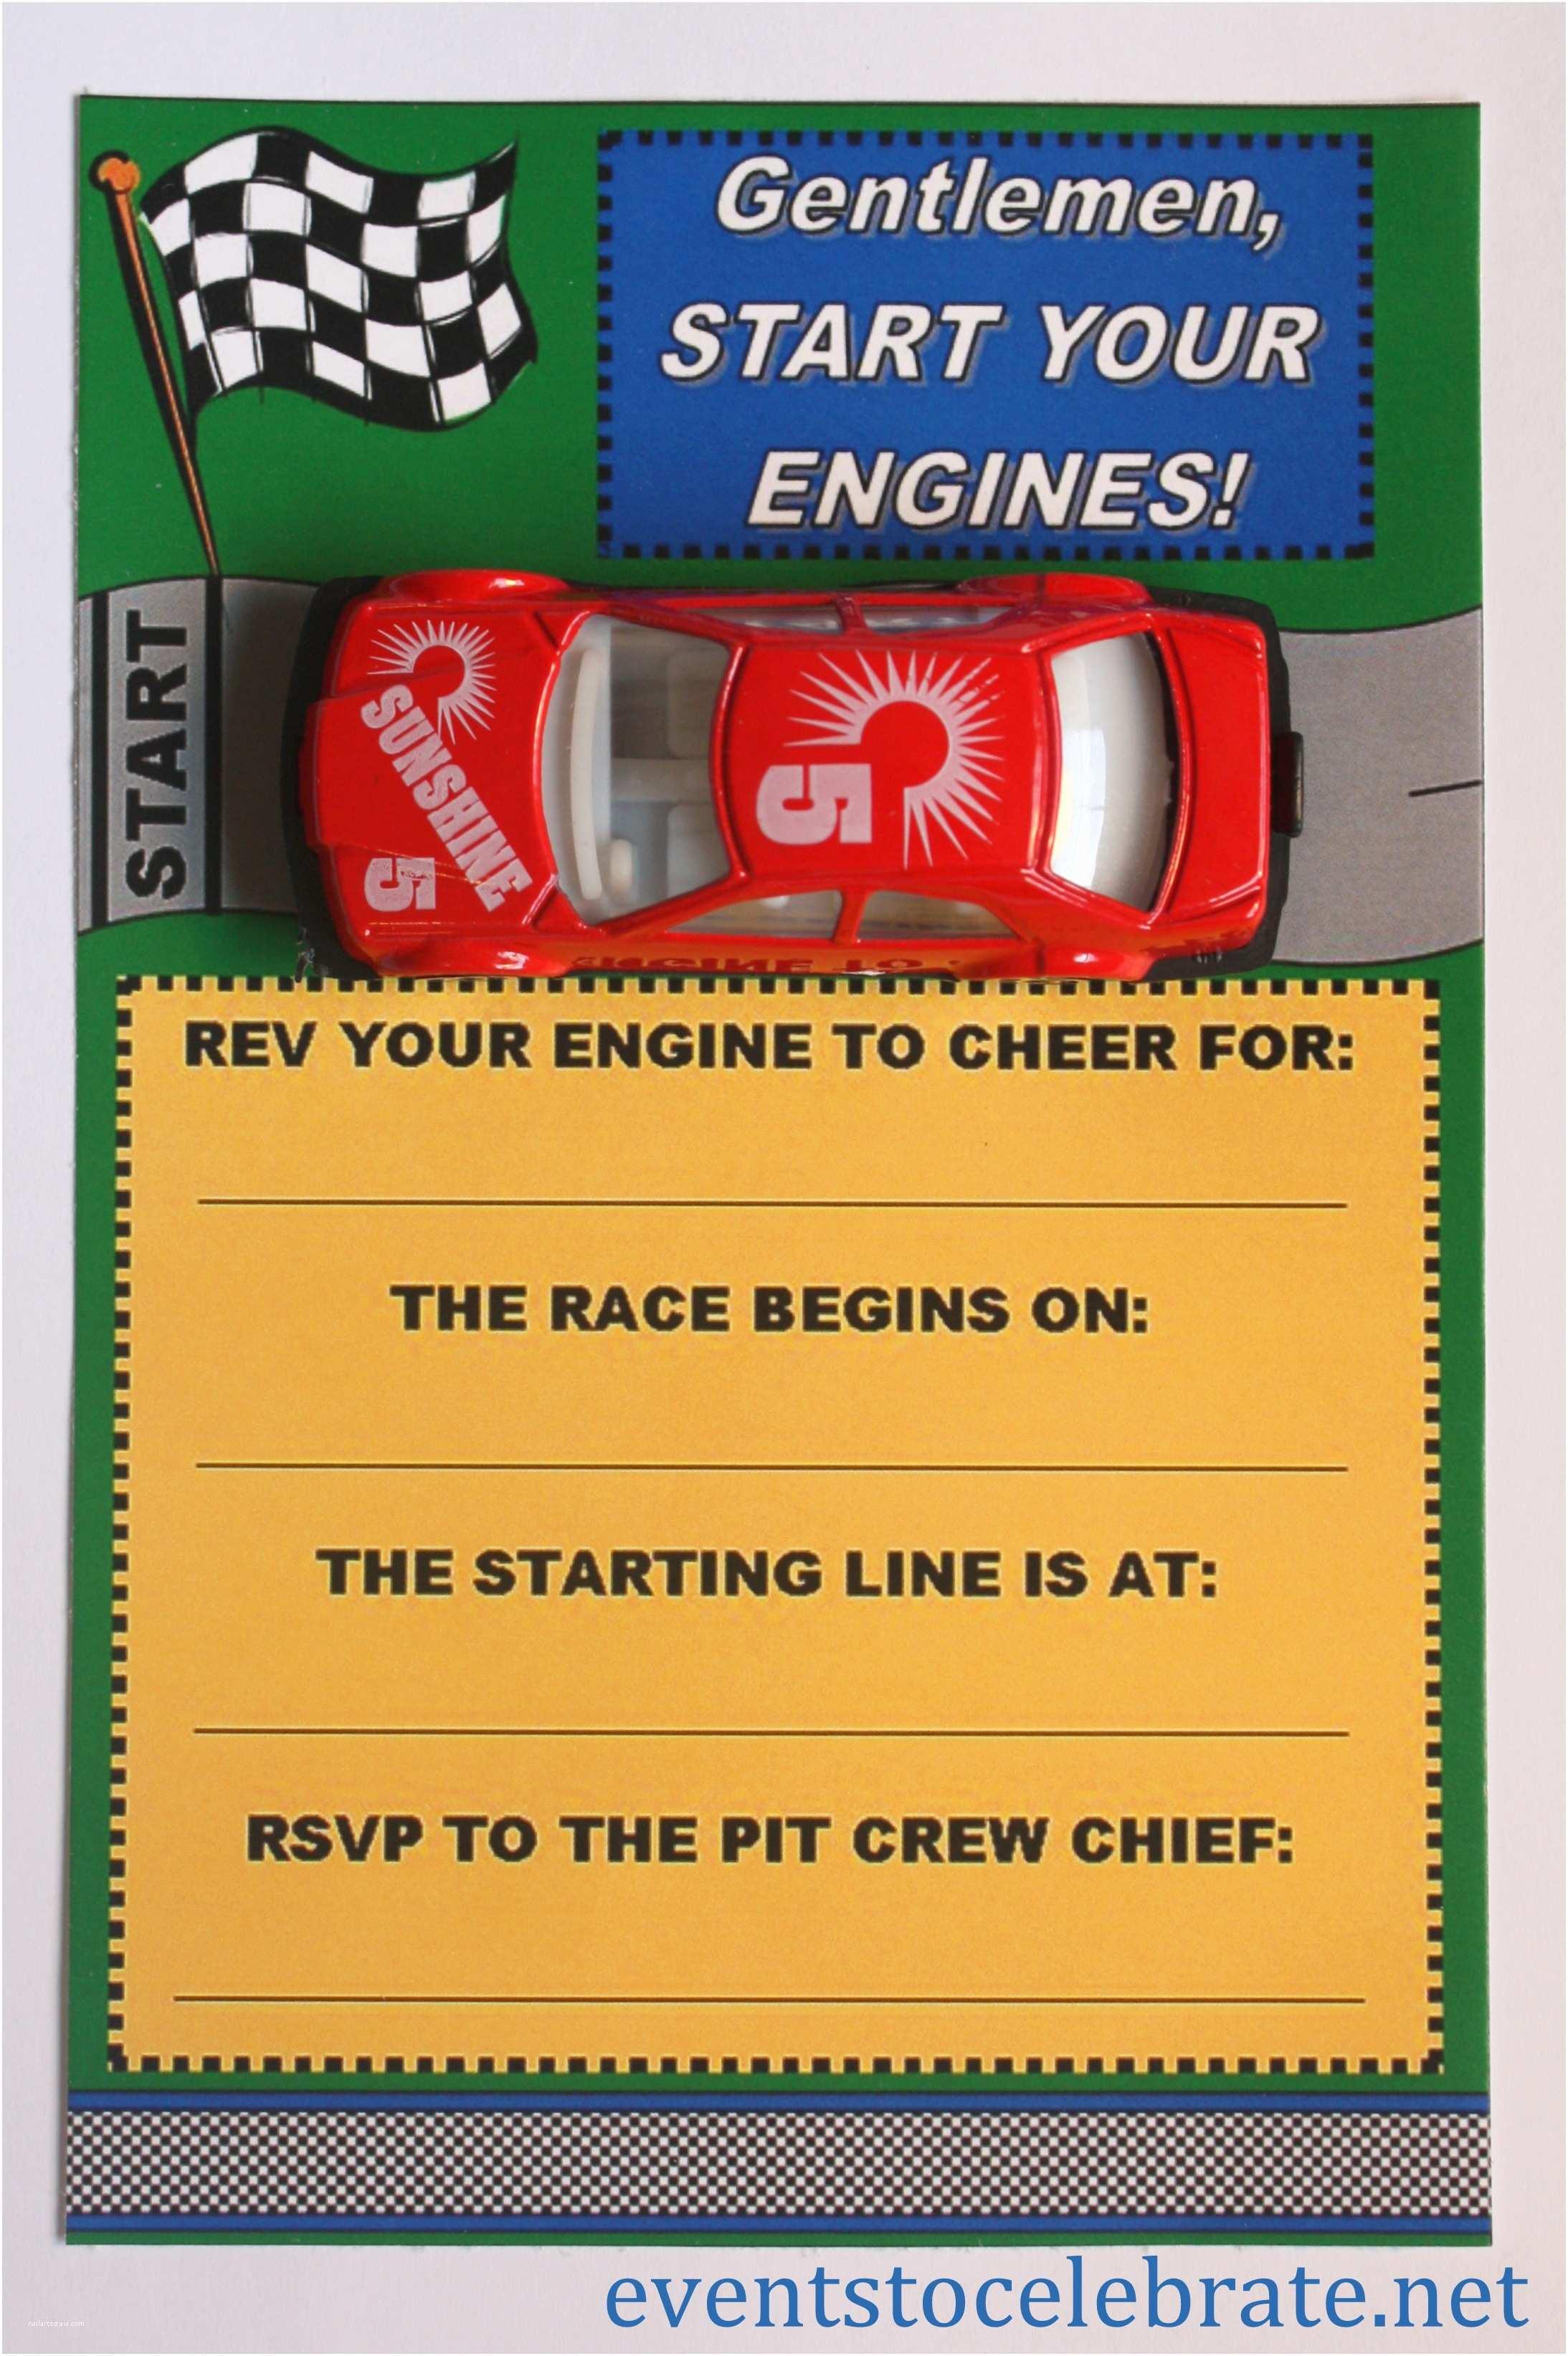 Free Printable Birthday Party Invitations Free Printable Invitations Army Car Racing & Swim Party